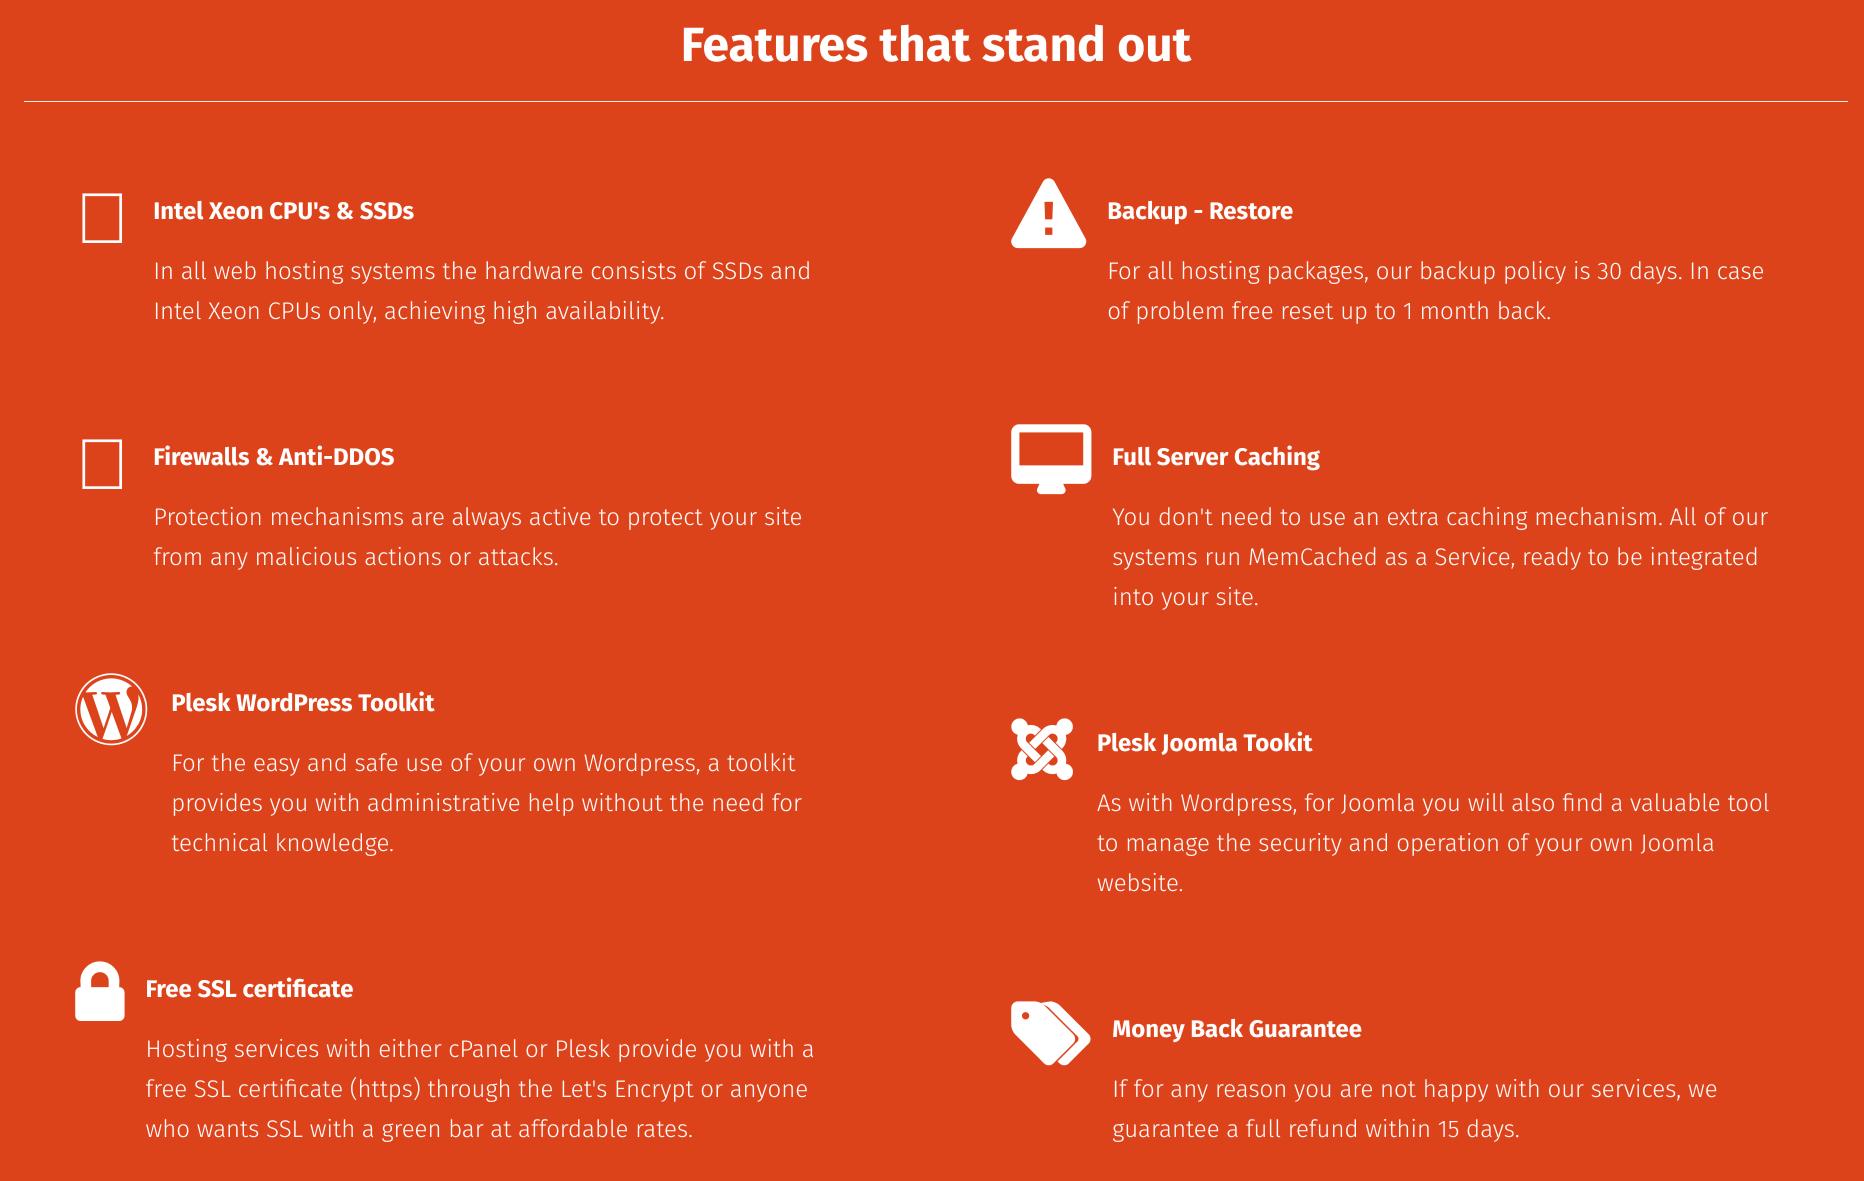 WebHosting|4U Overview